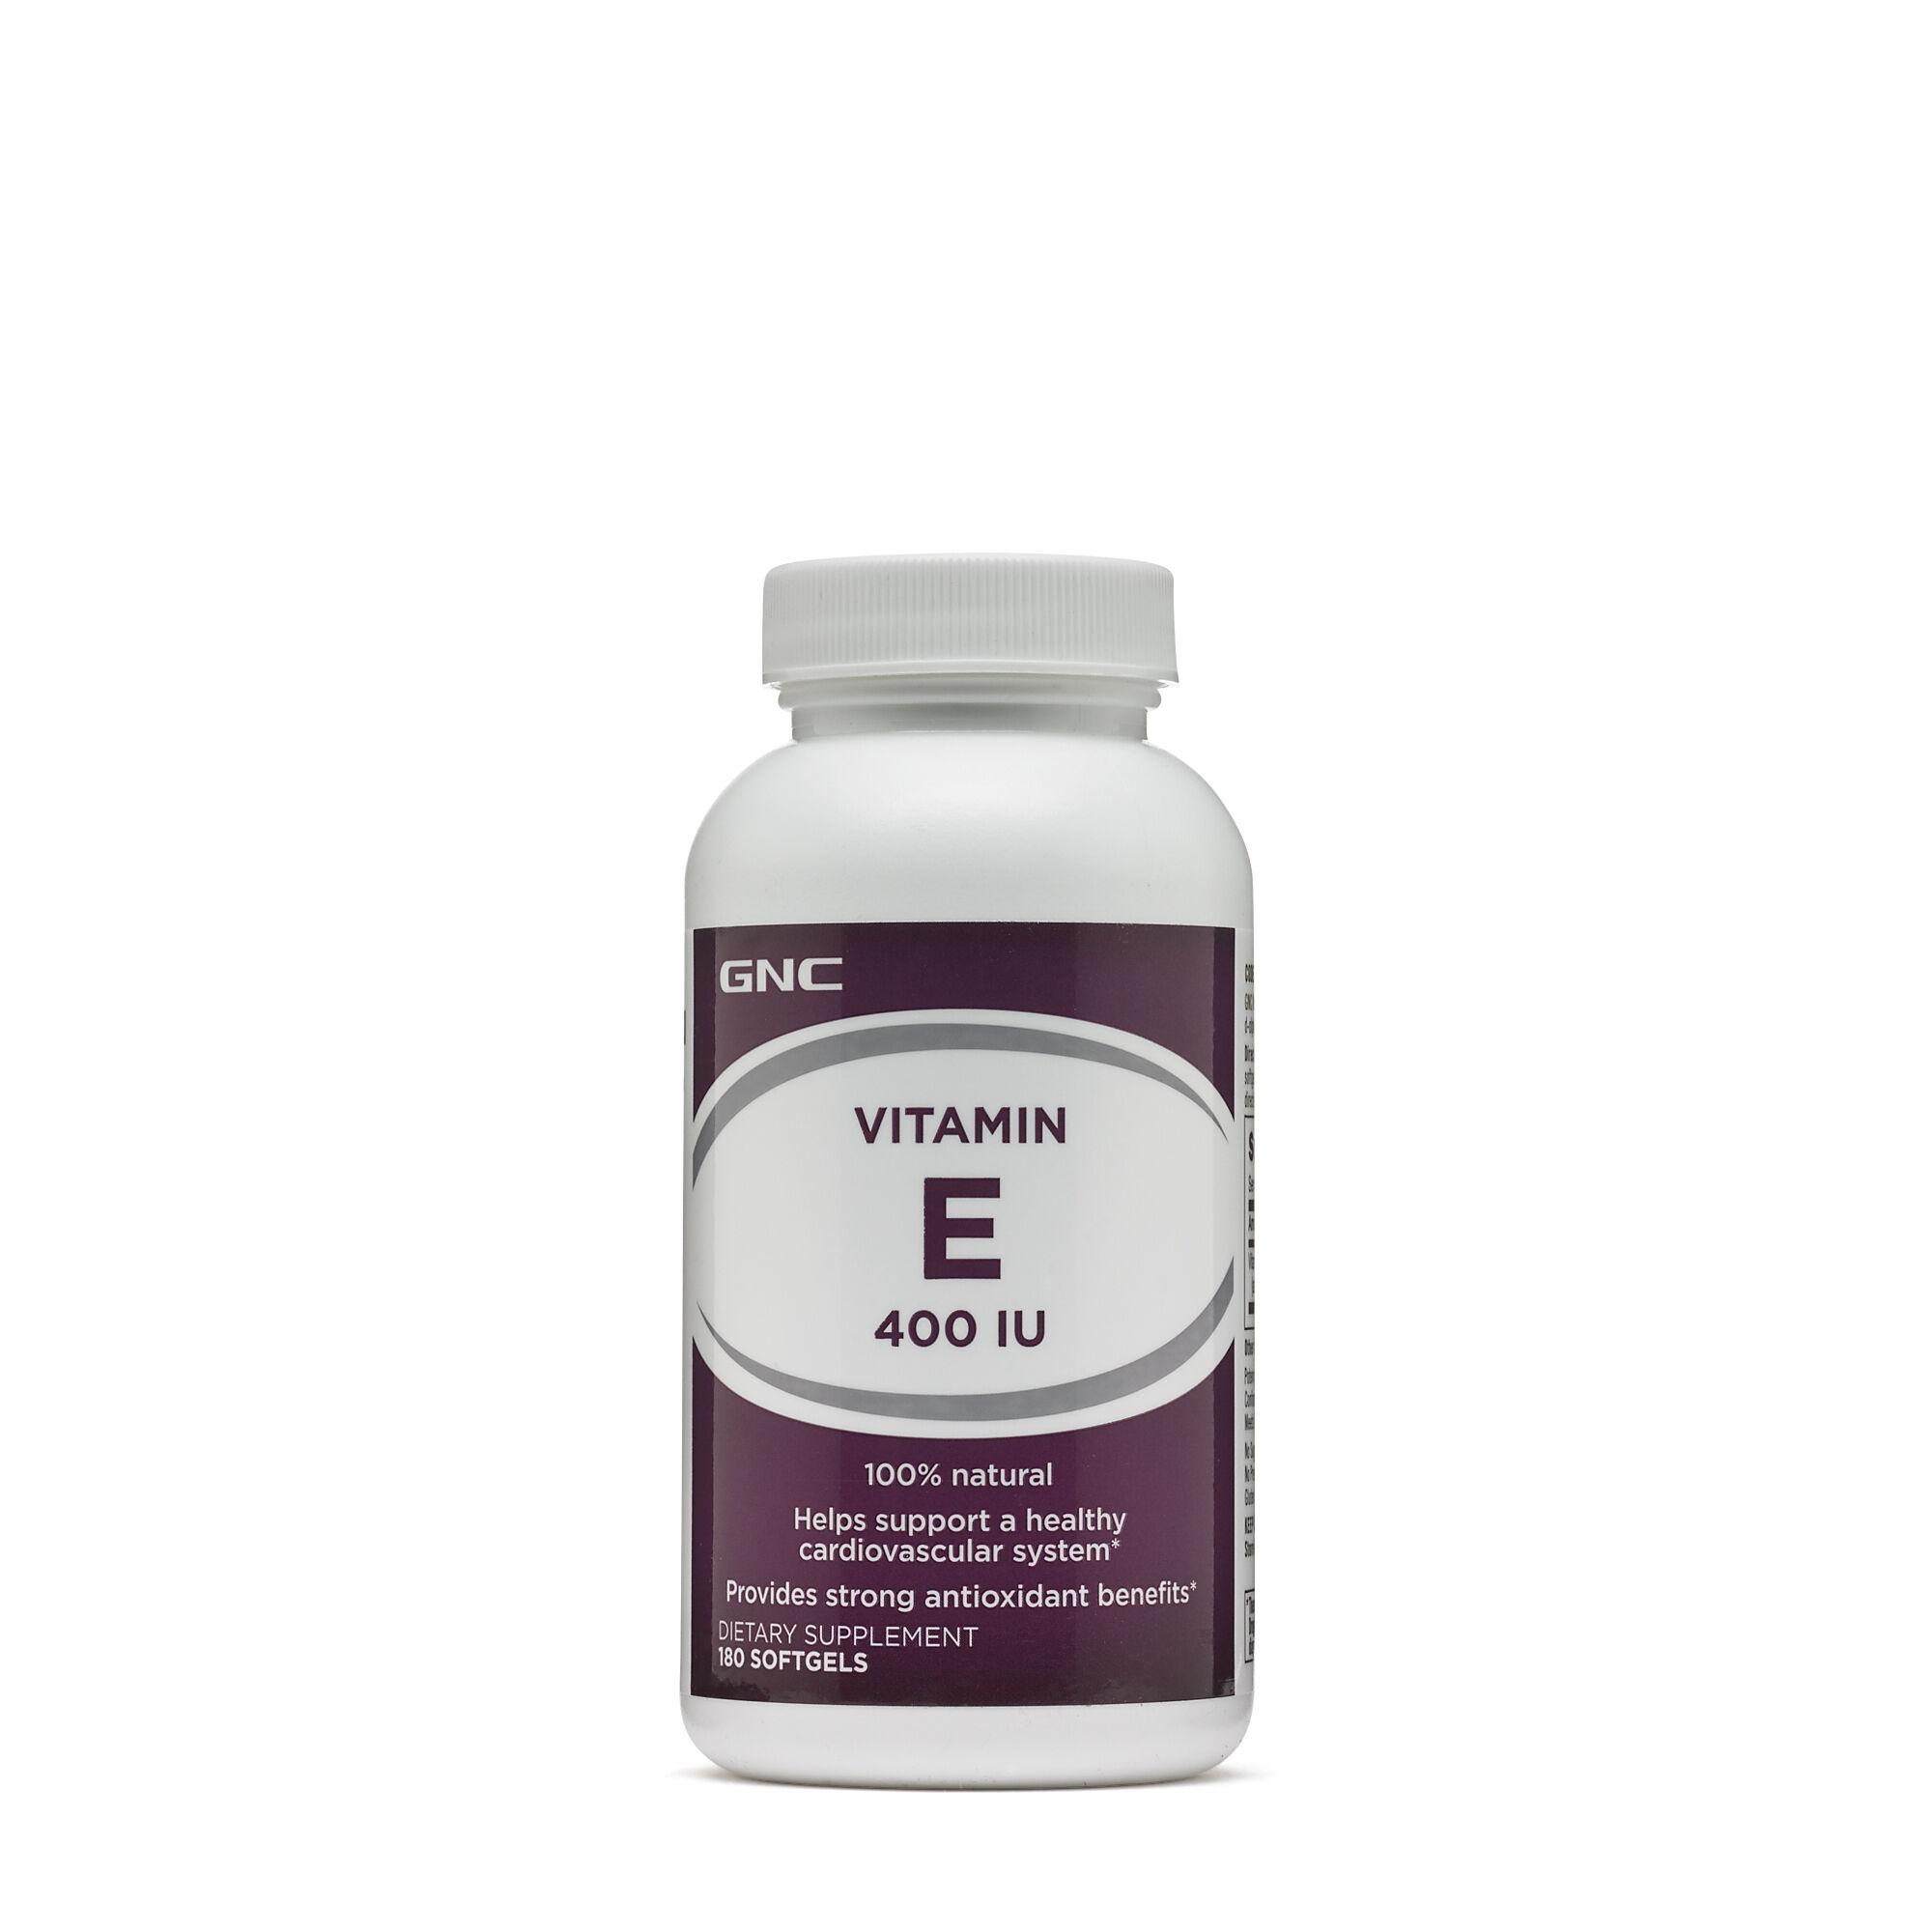 Gnc Vitamin E 400 Iu Gnc